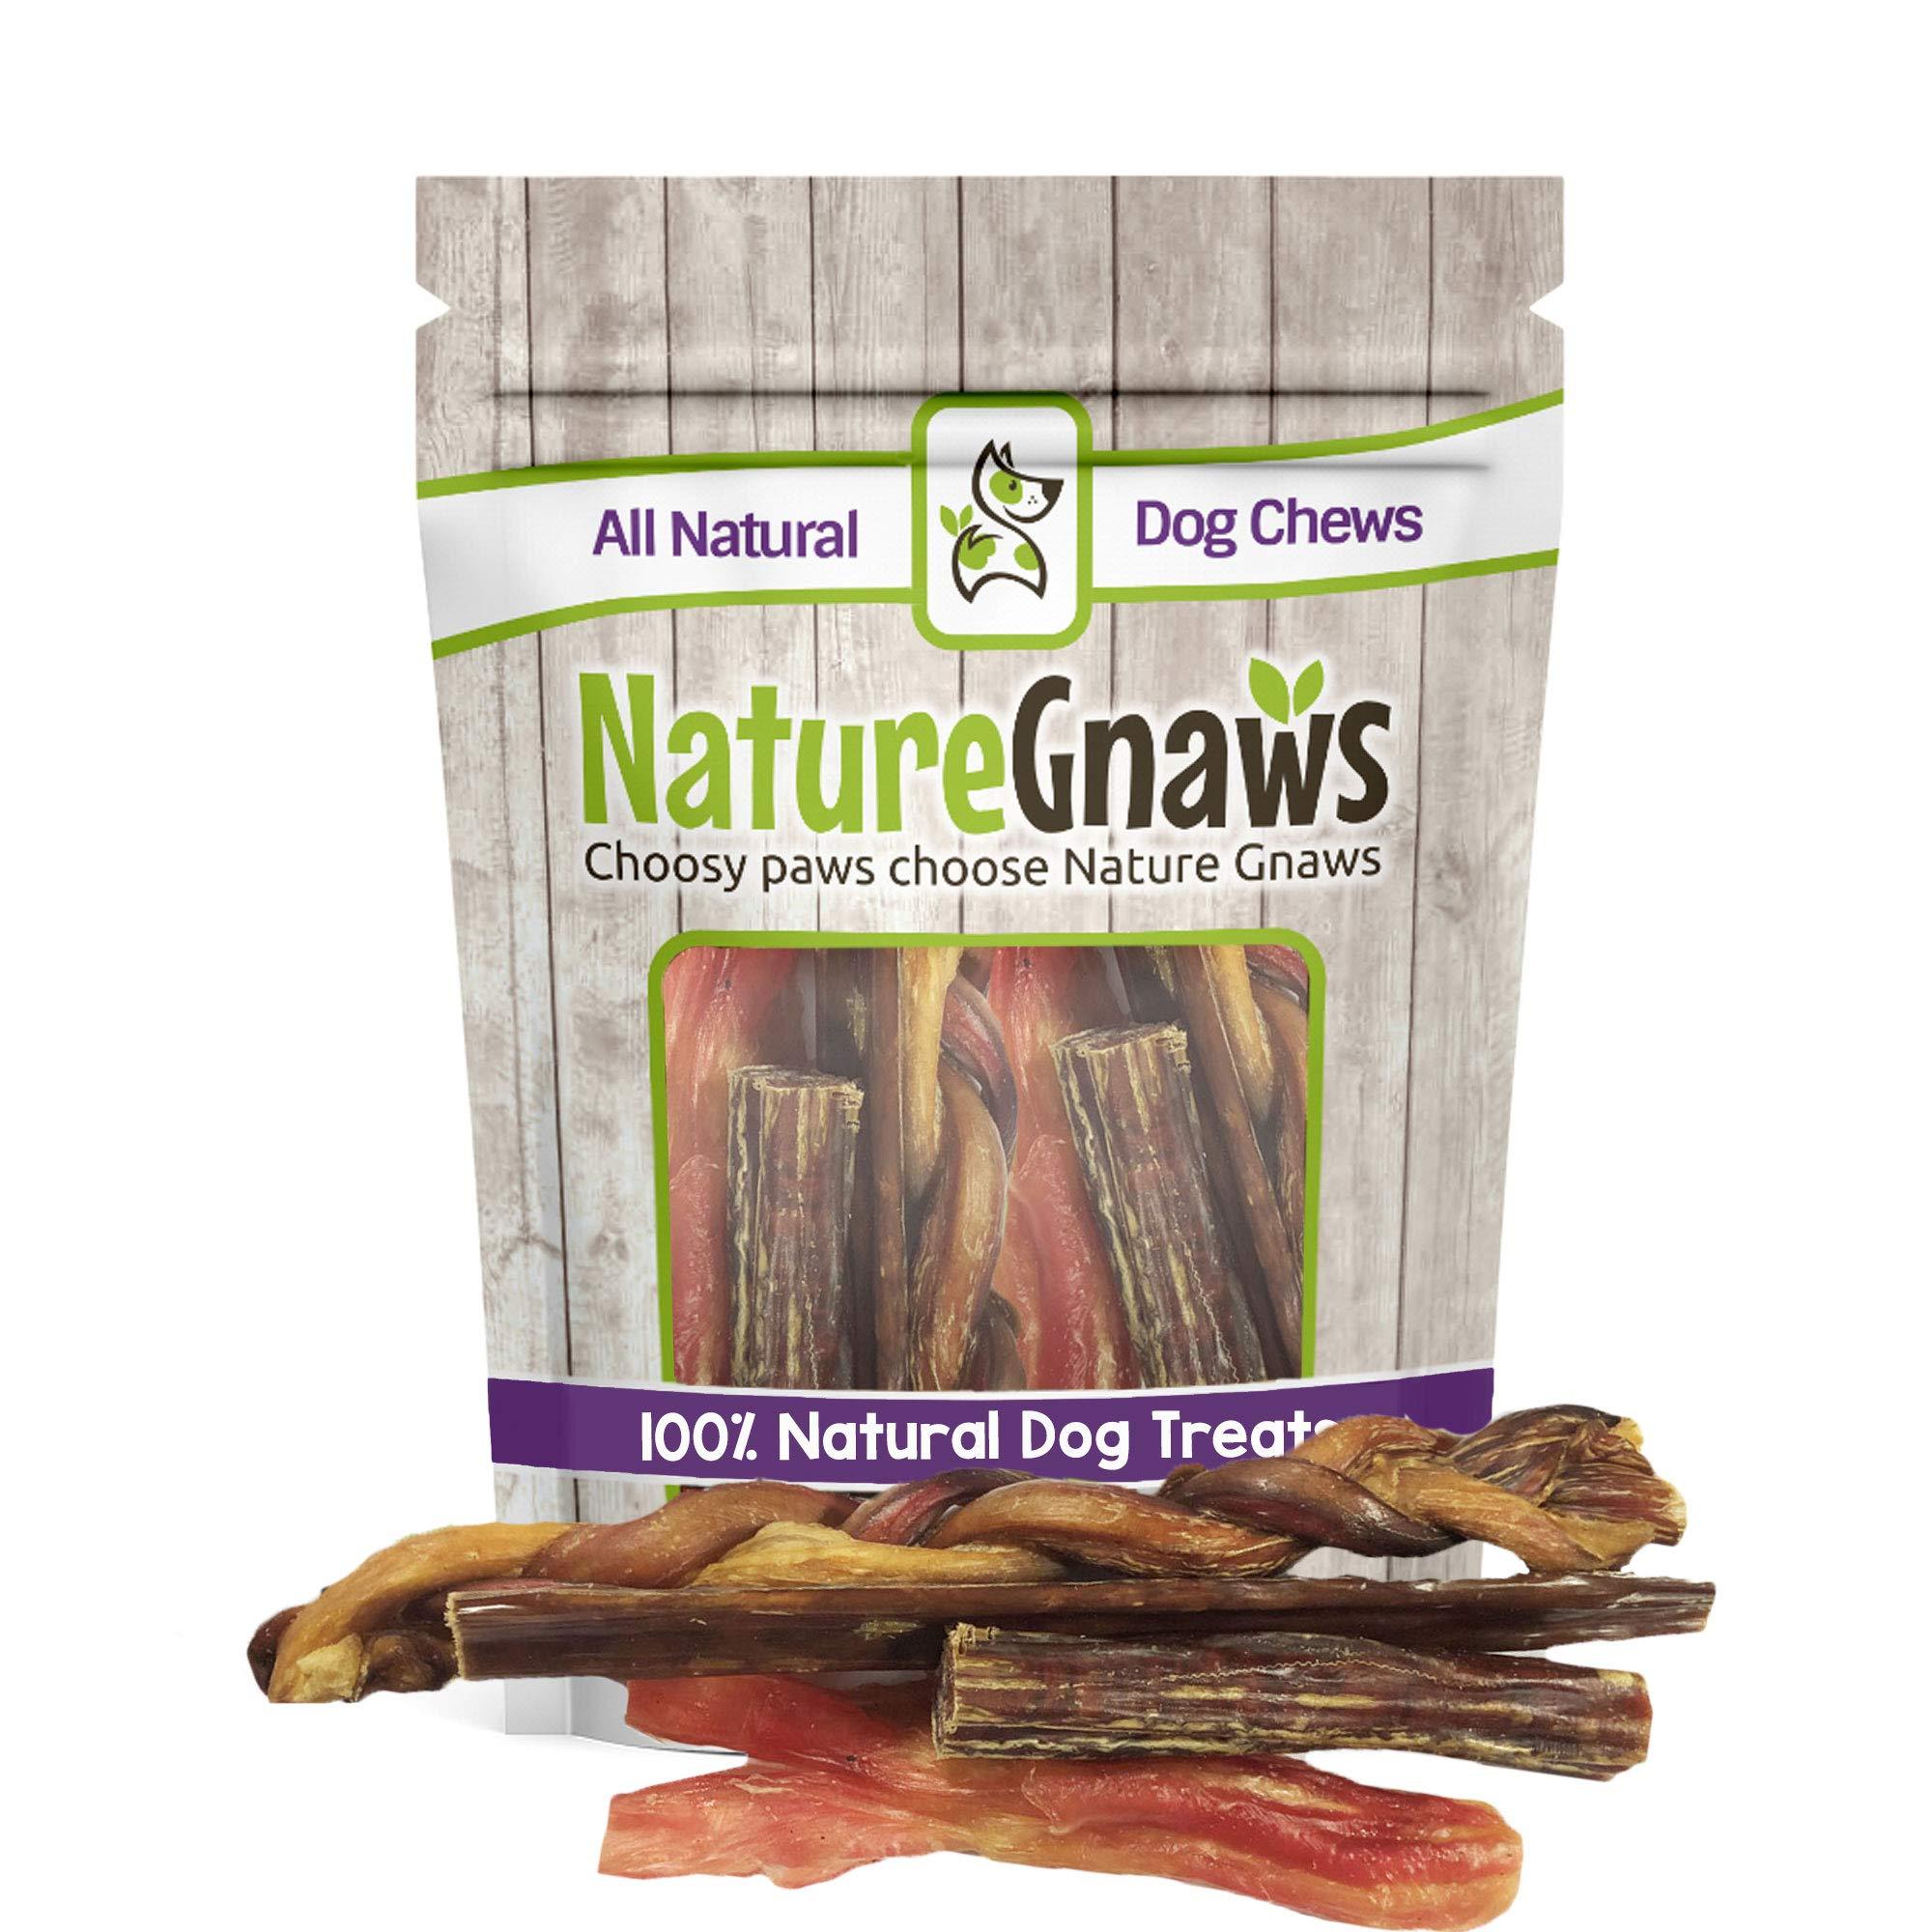 Nature Gnaws Large Variety Pack - 100% Natural Dog Chew Treats